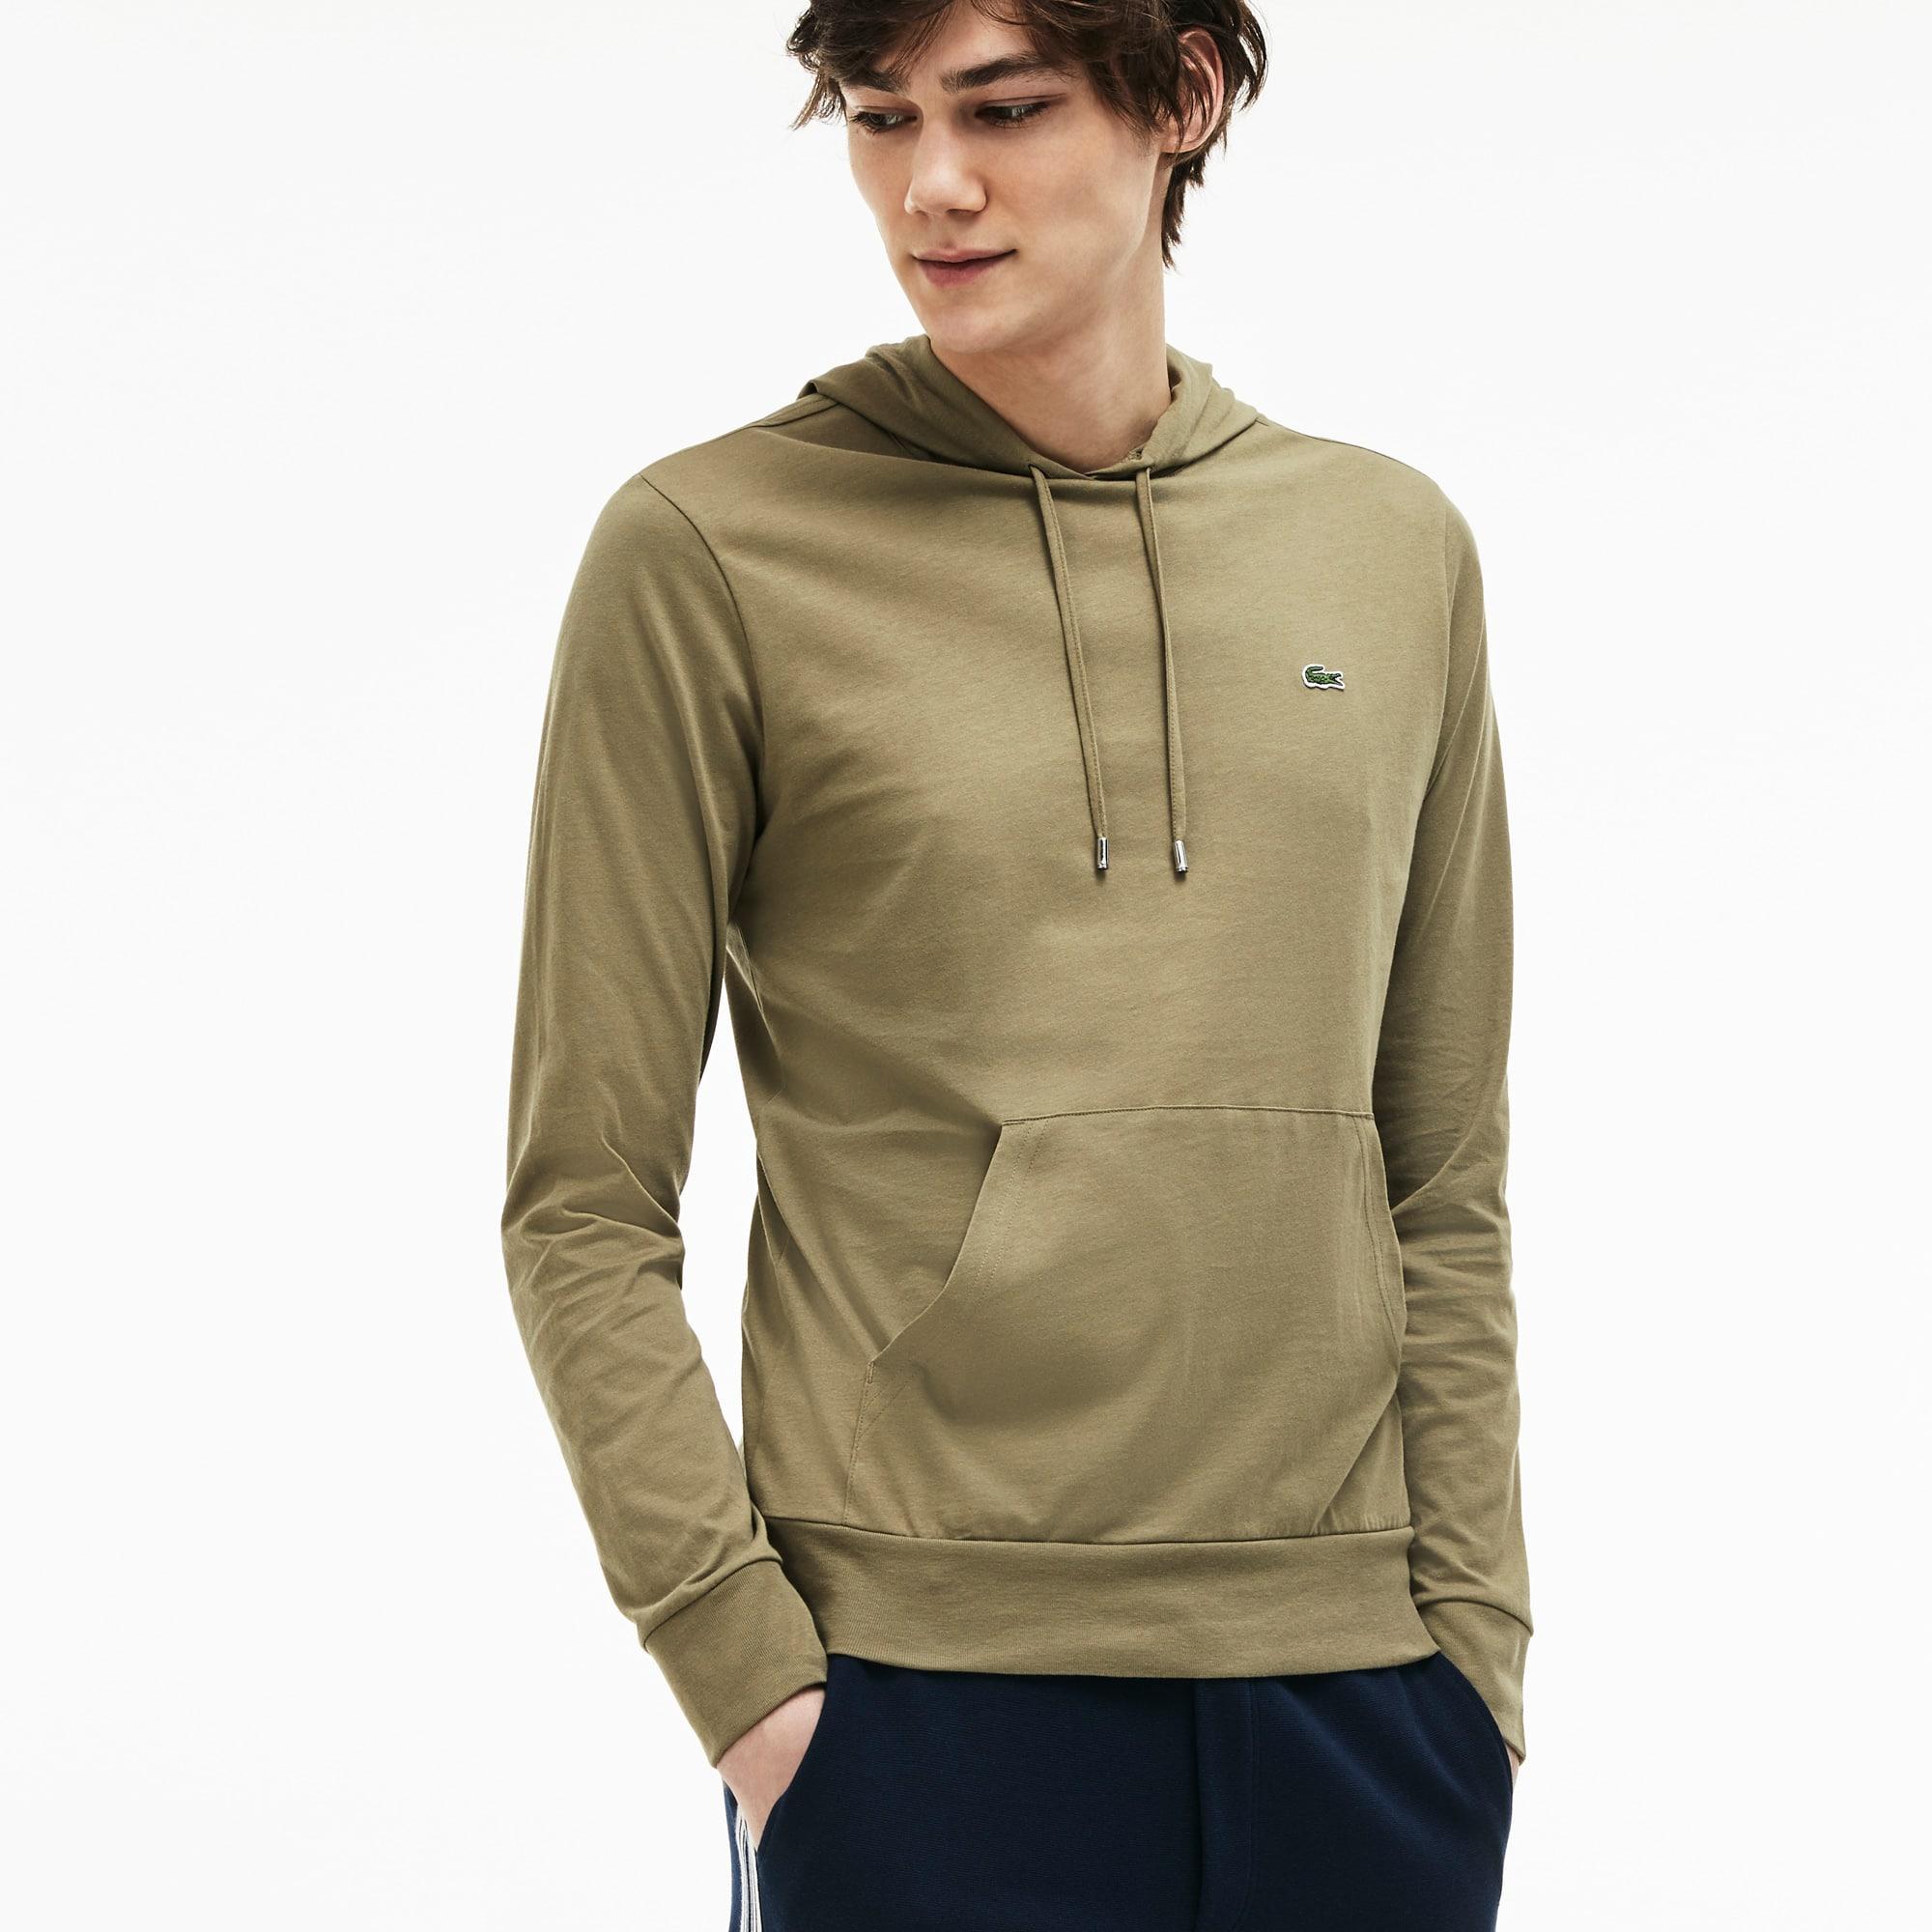 39c9f16ced Men's Sweatshirts | Hoodies | LACOSTE